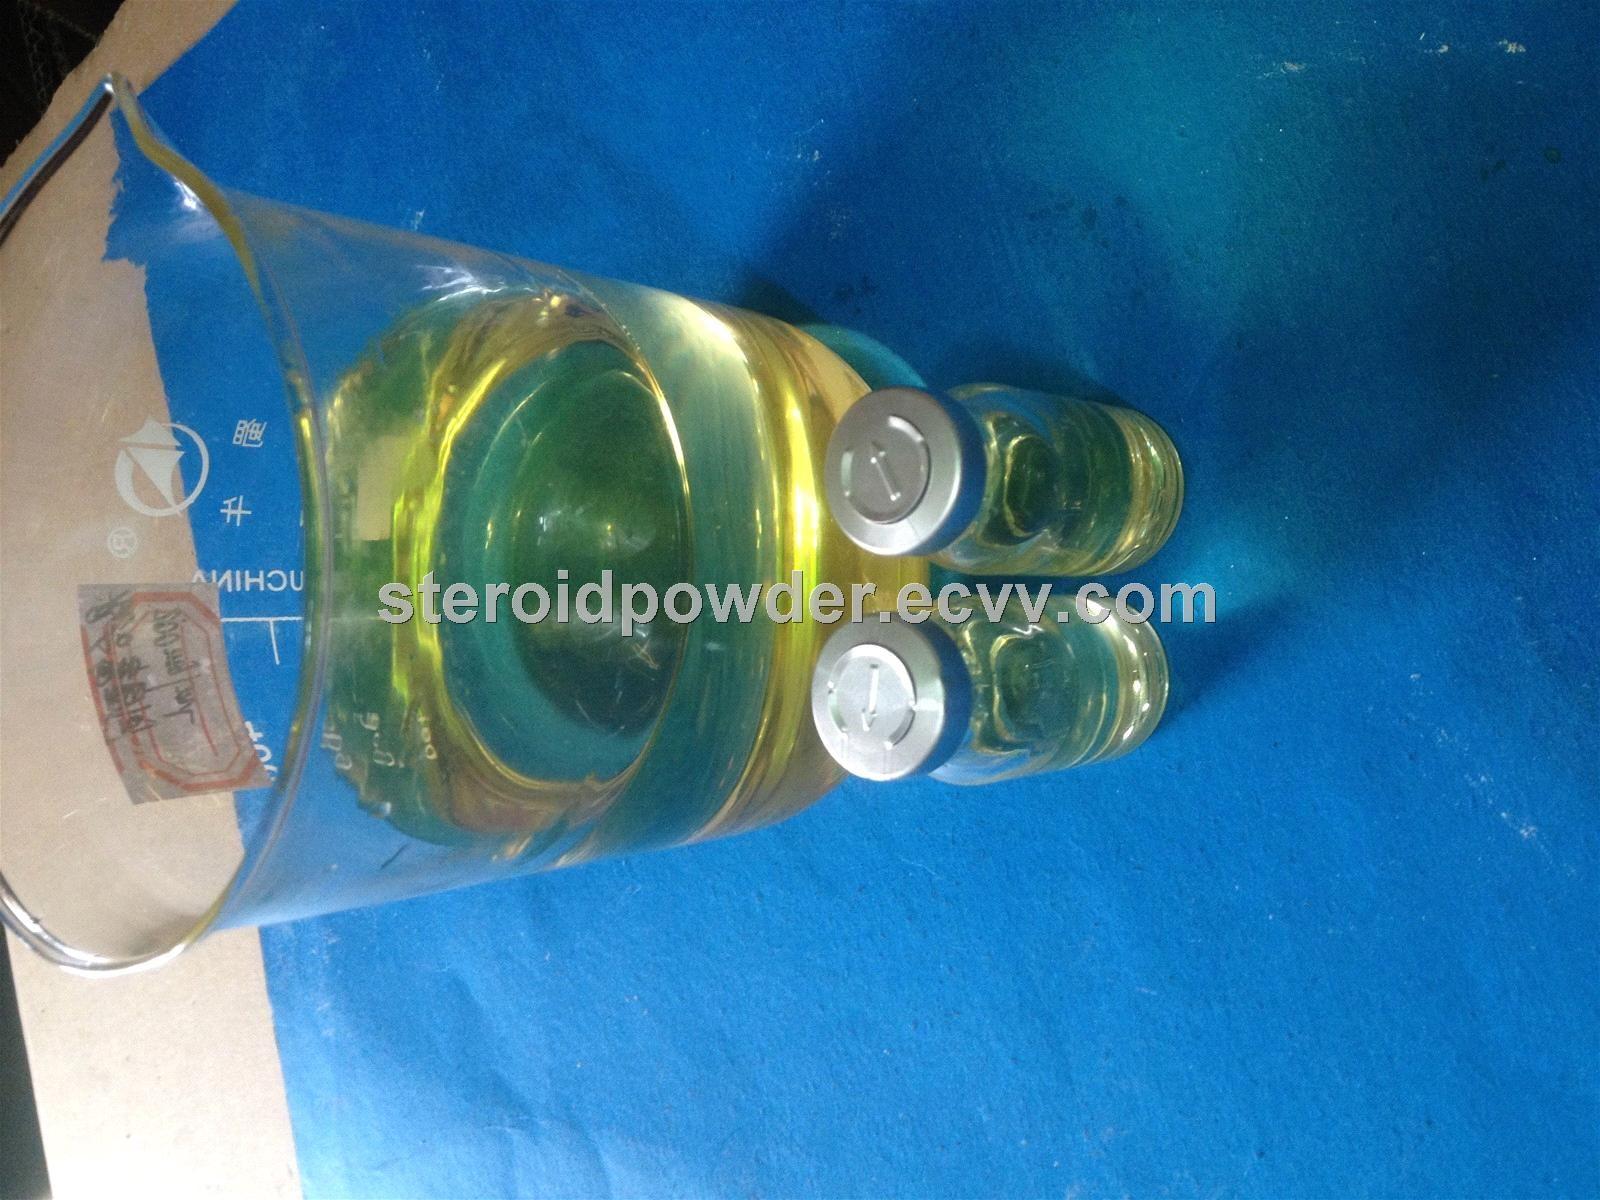 250mg/ml Oil-based Testosterone Cypionate Bodybuilding Anabolic